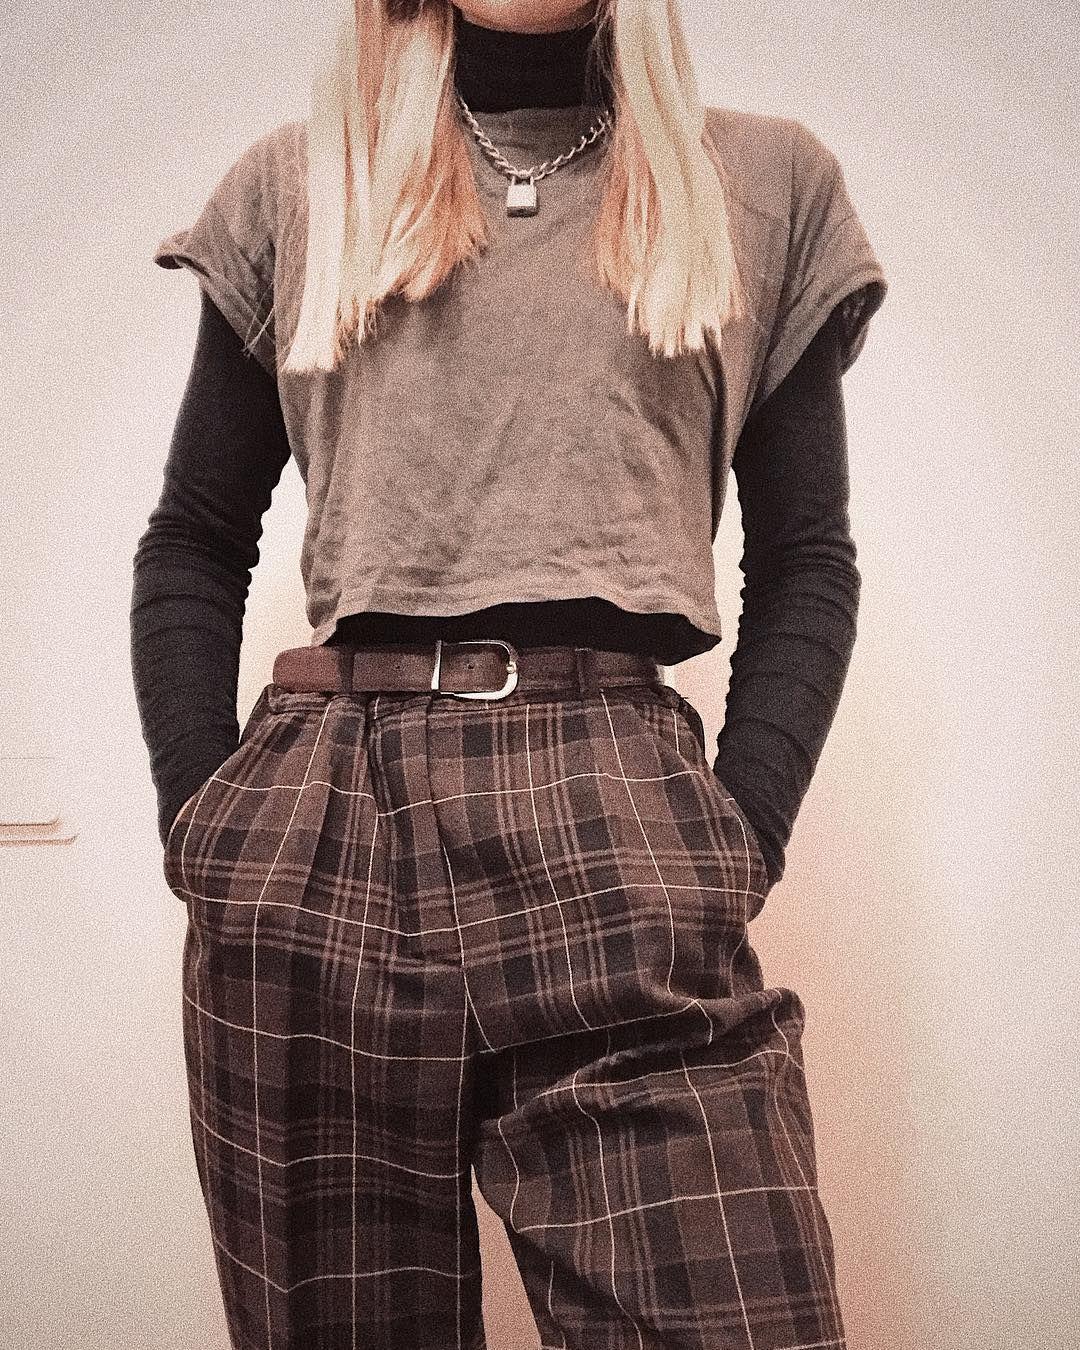 Emmylo Elmo Elmered Ersson On Instagram Yee Girl Grungefashion Grungeblog Egirl Grun Outfits Invierno Retro Outfits Aesthetic Clothes